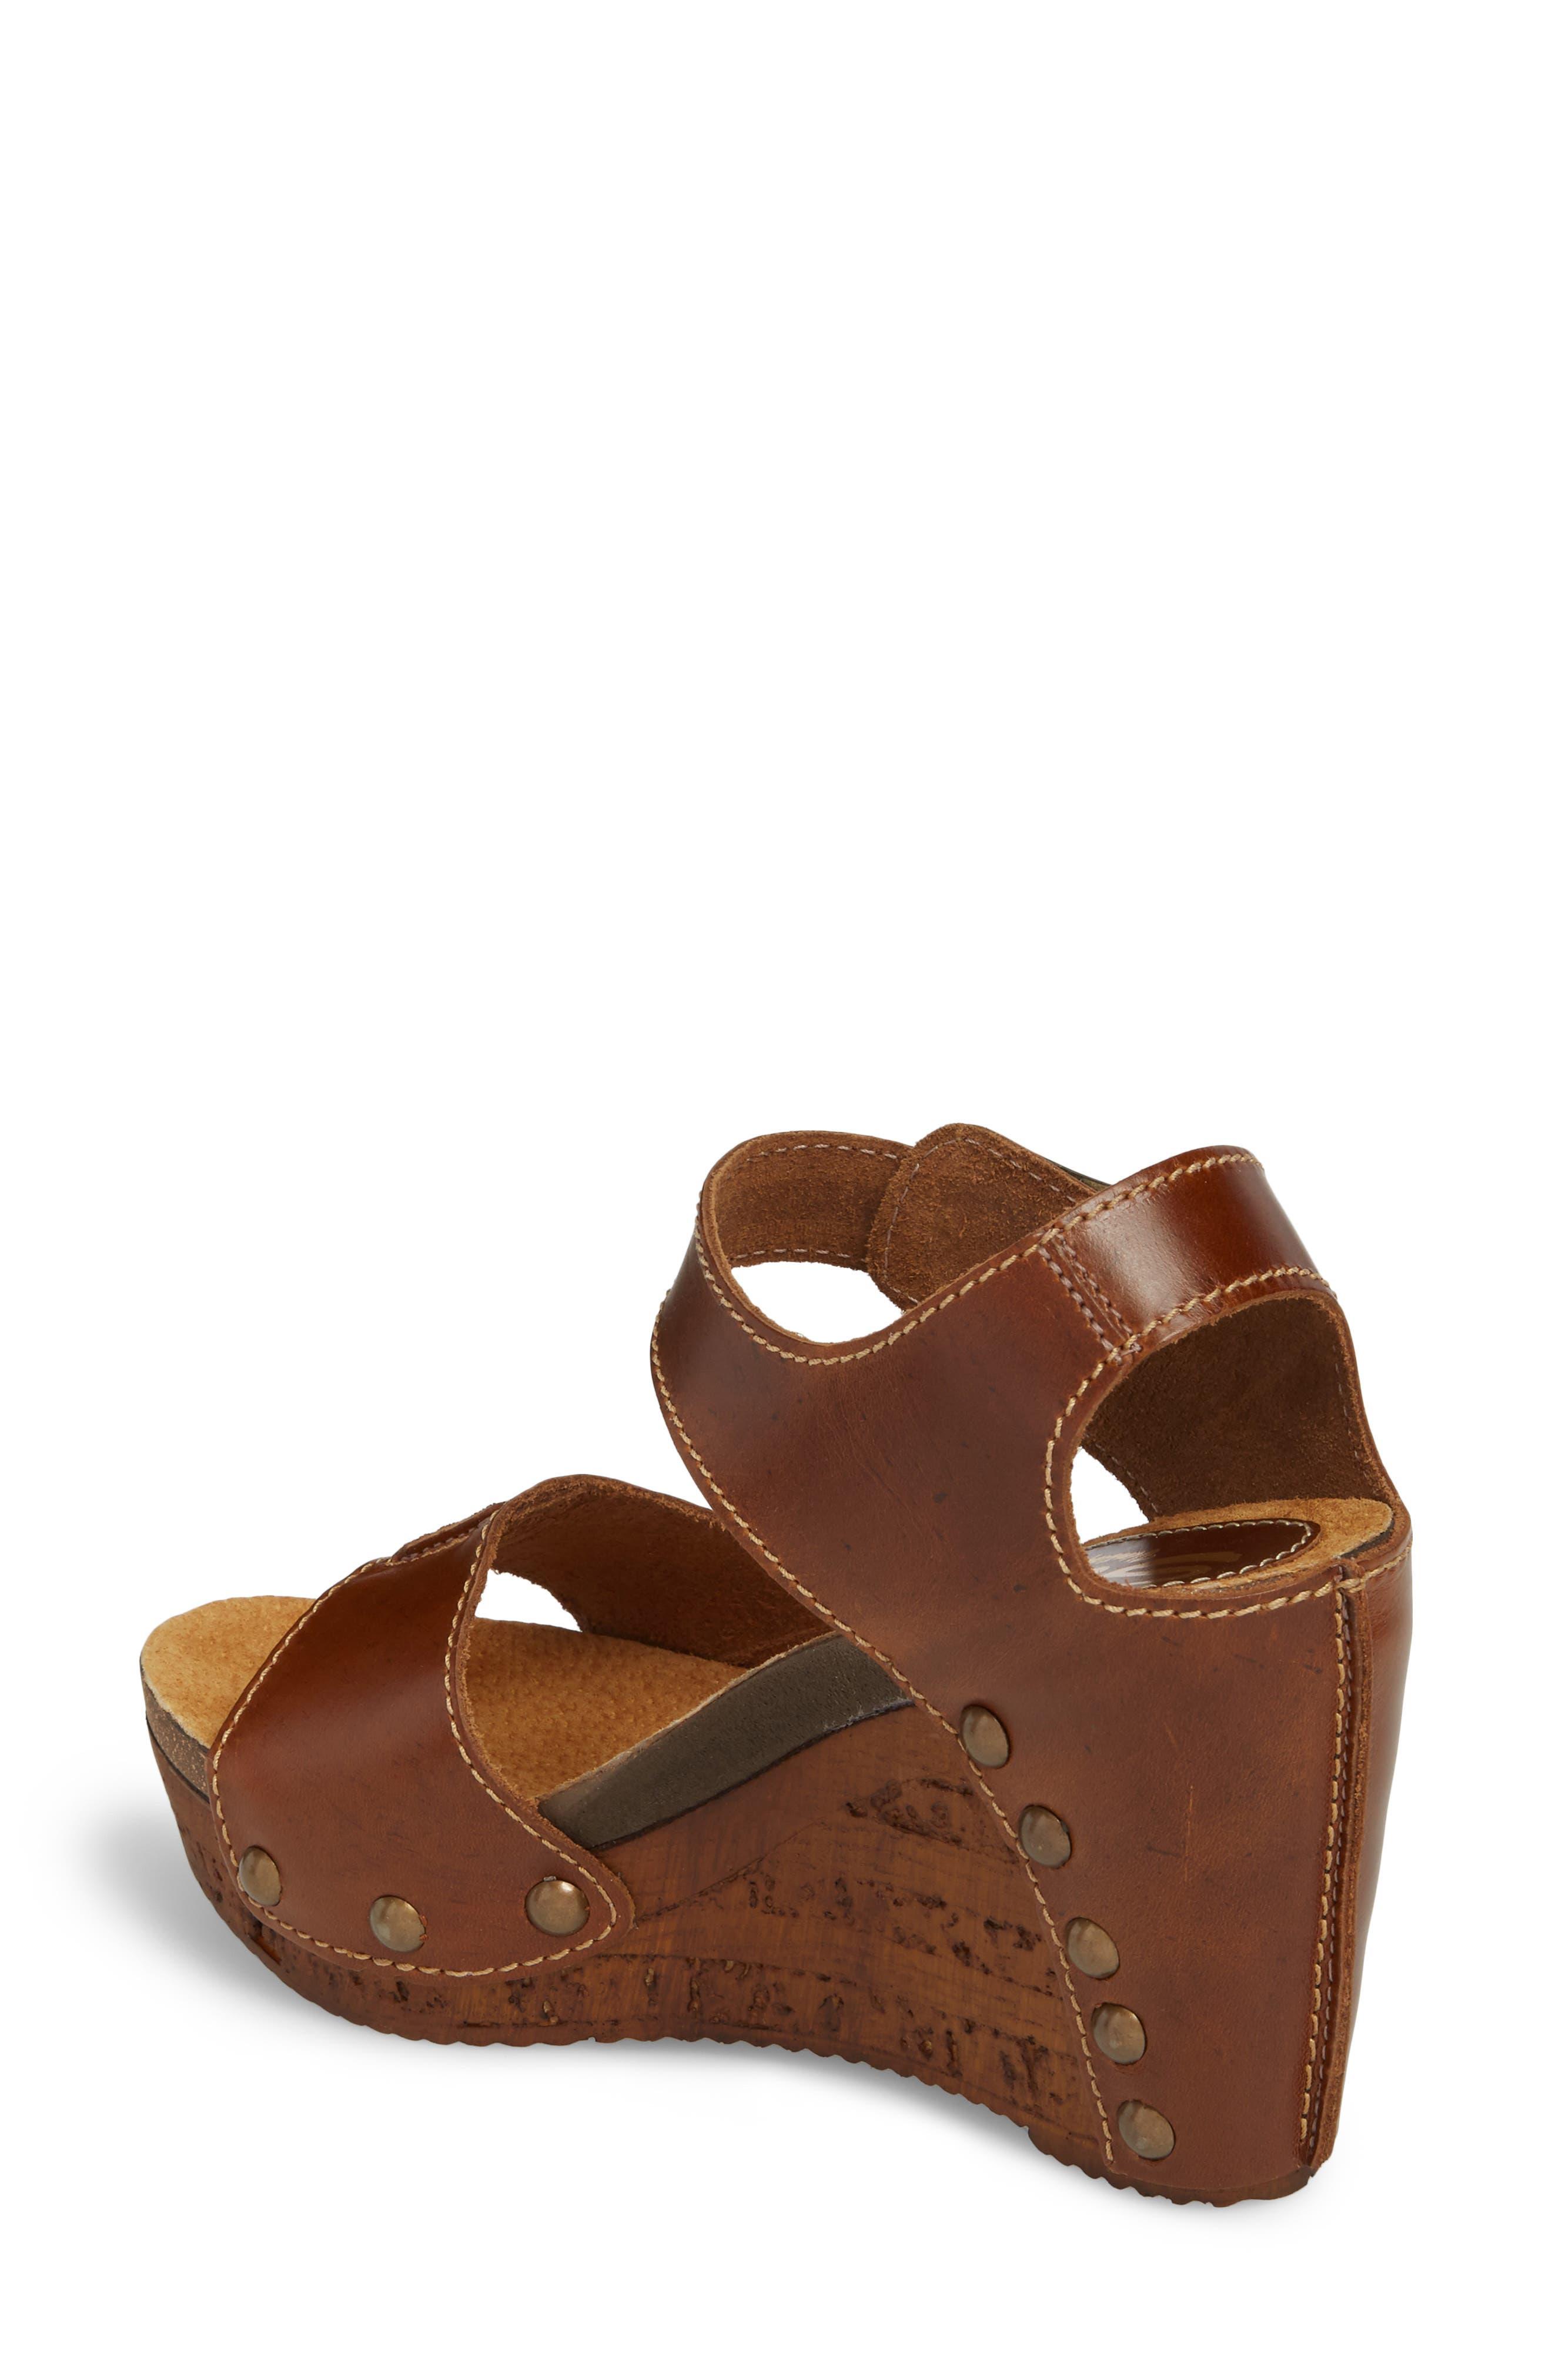 Alternate Image 2  - Sbicca Brella Studded Platform Wedge Sandal (Women)